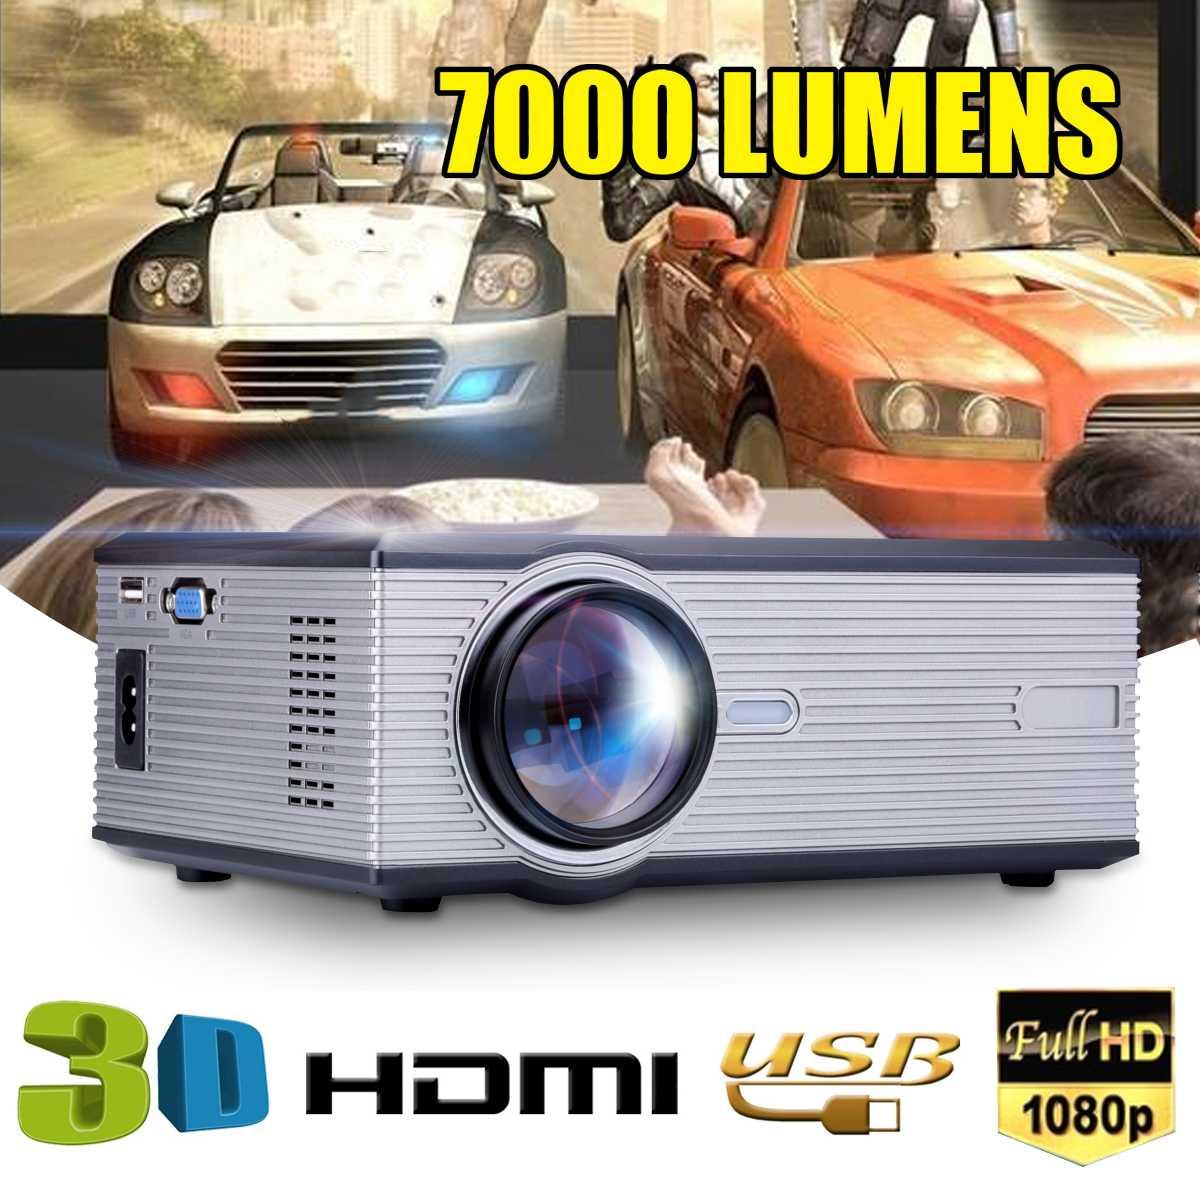 1080 P vidéoprojecteur LED pour Home cinéma 7000 Lumen support Full HD Mini projecteur HDMI/USB/SD/AV/VGA HOME cinéma